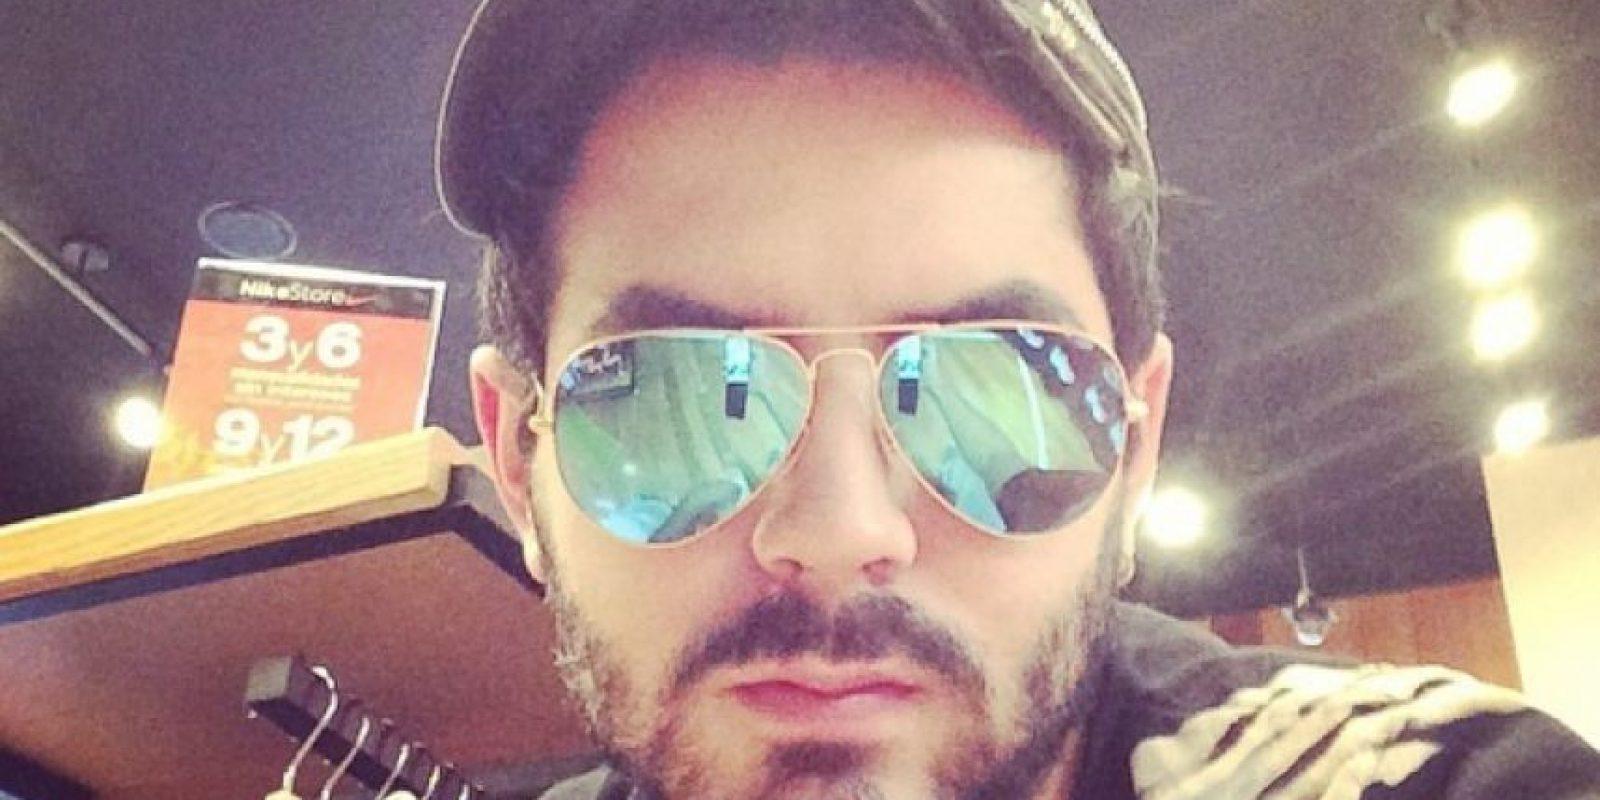 José Eduardo Derbez es el acusado Foto:Instagram @jose_eduardo92